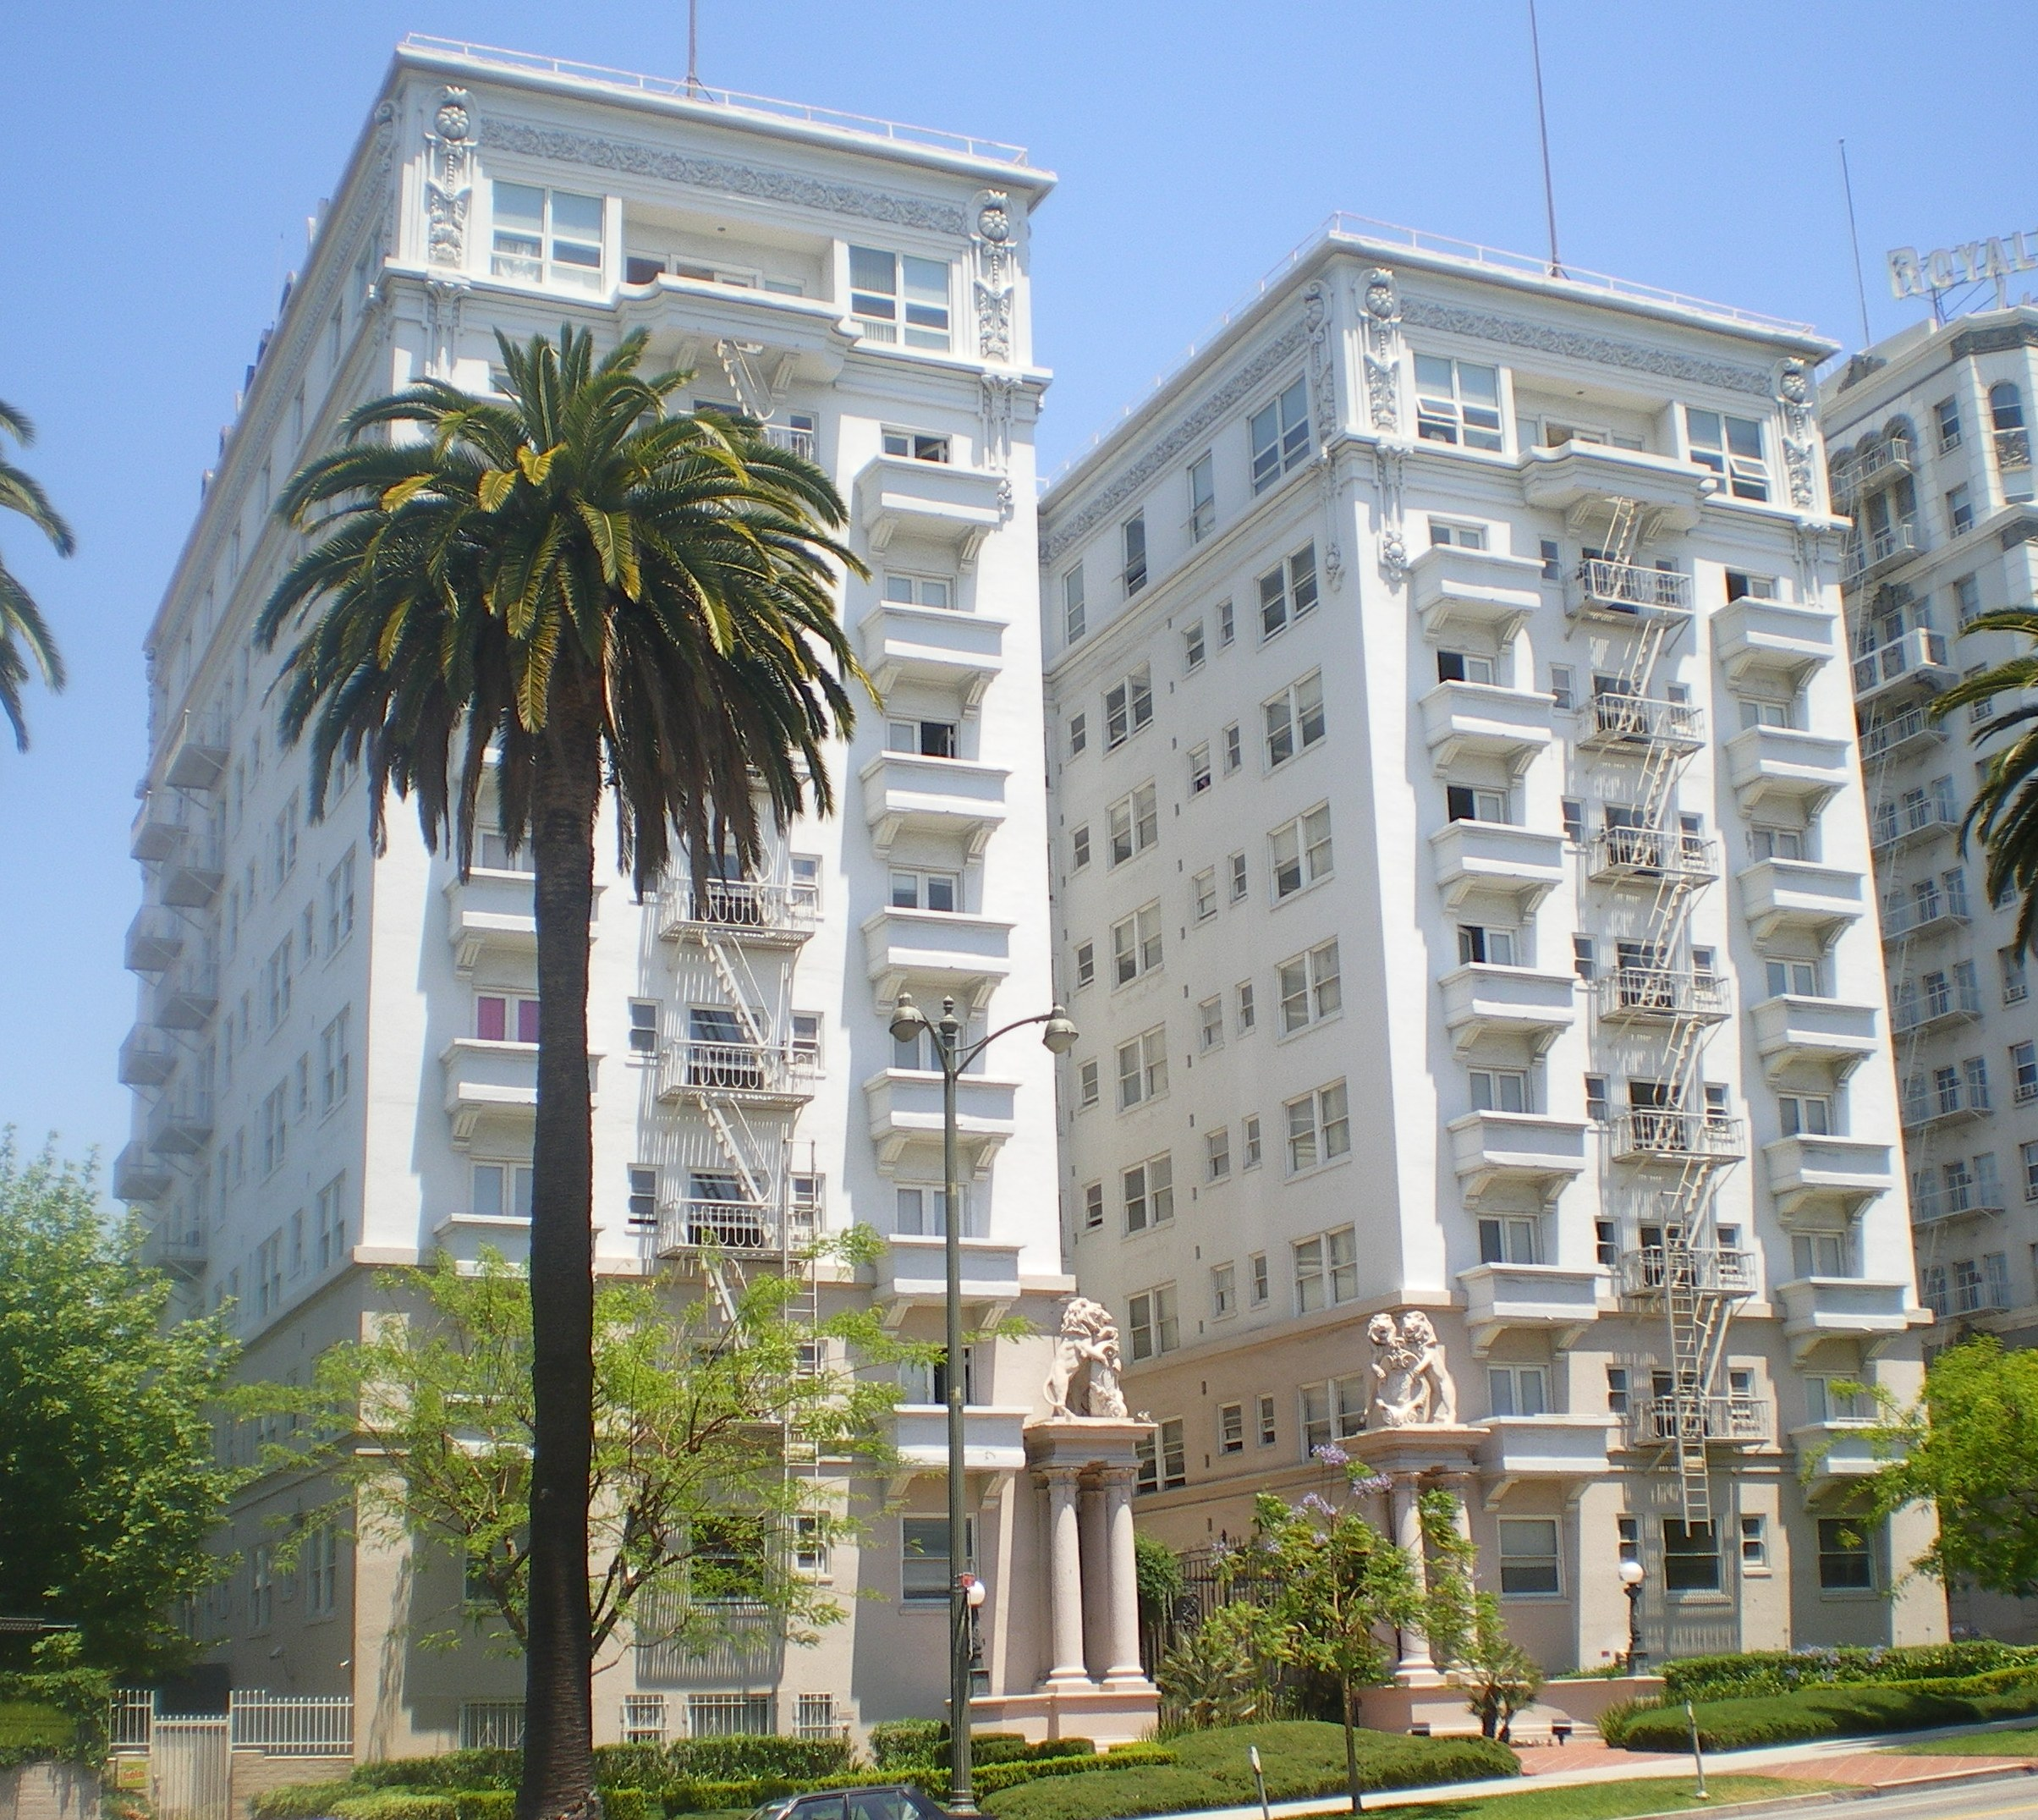 Bryson_Apartment_Hotel,_Los_Angeles.JPG